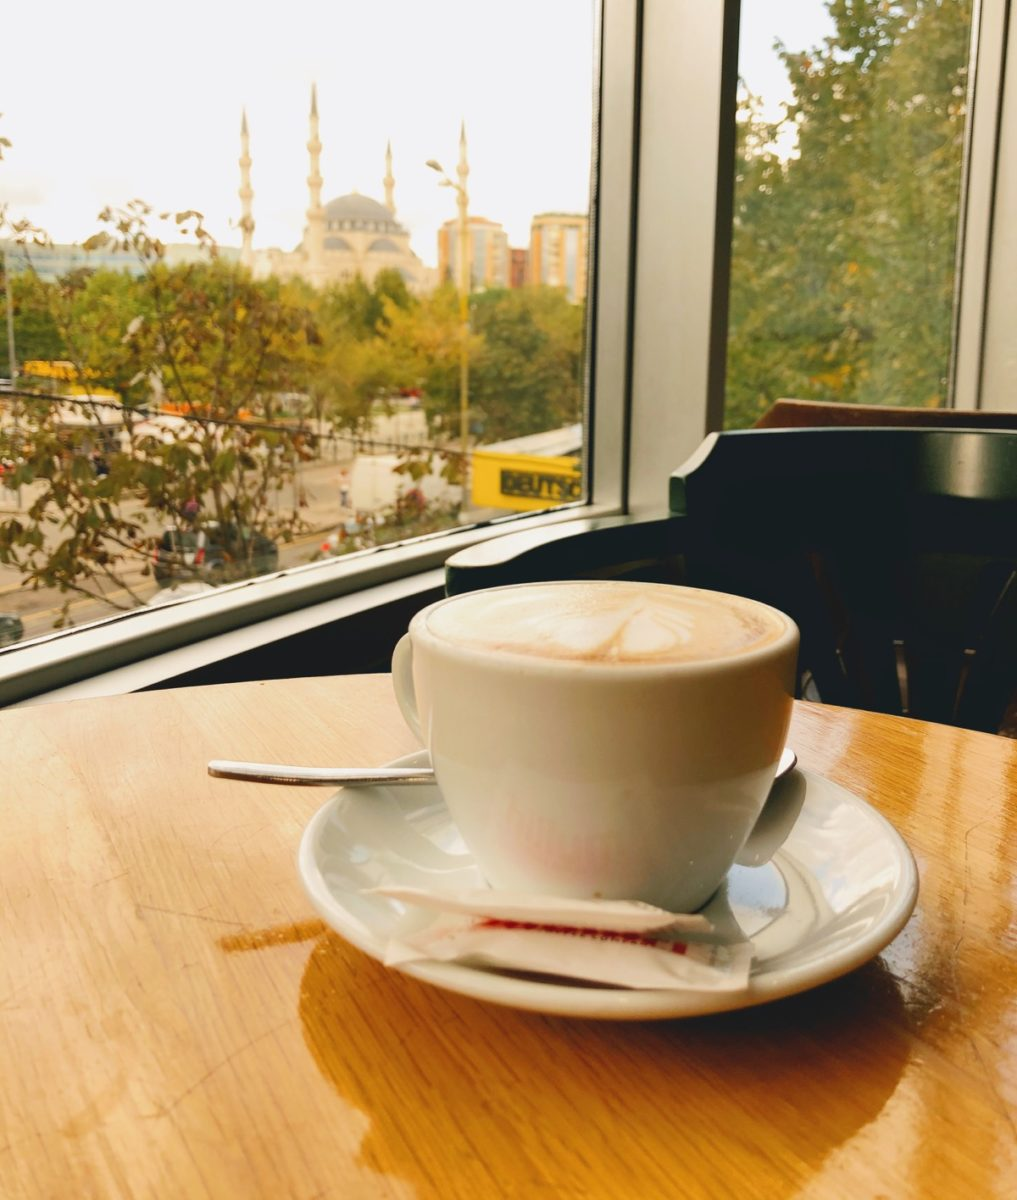 Mulliri Tirana Albania Cafe Coffee